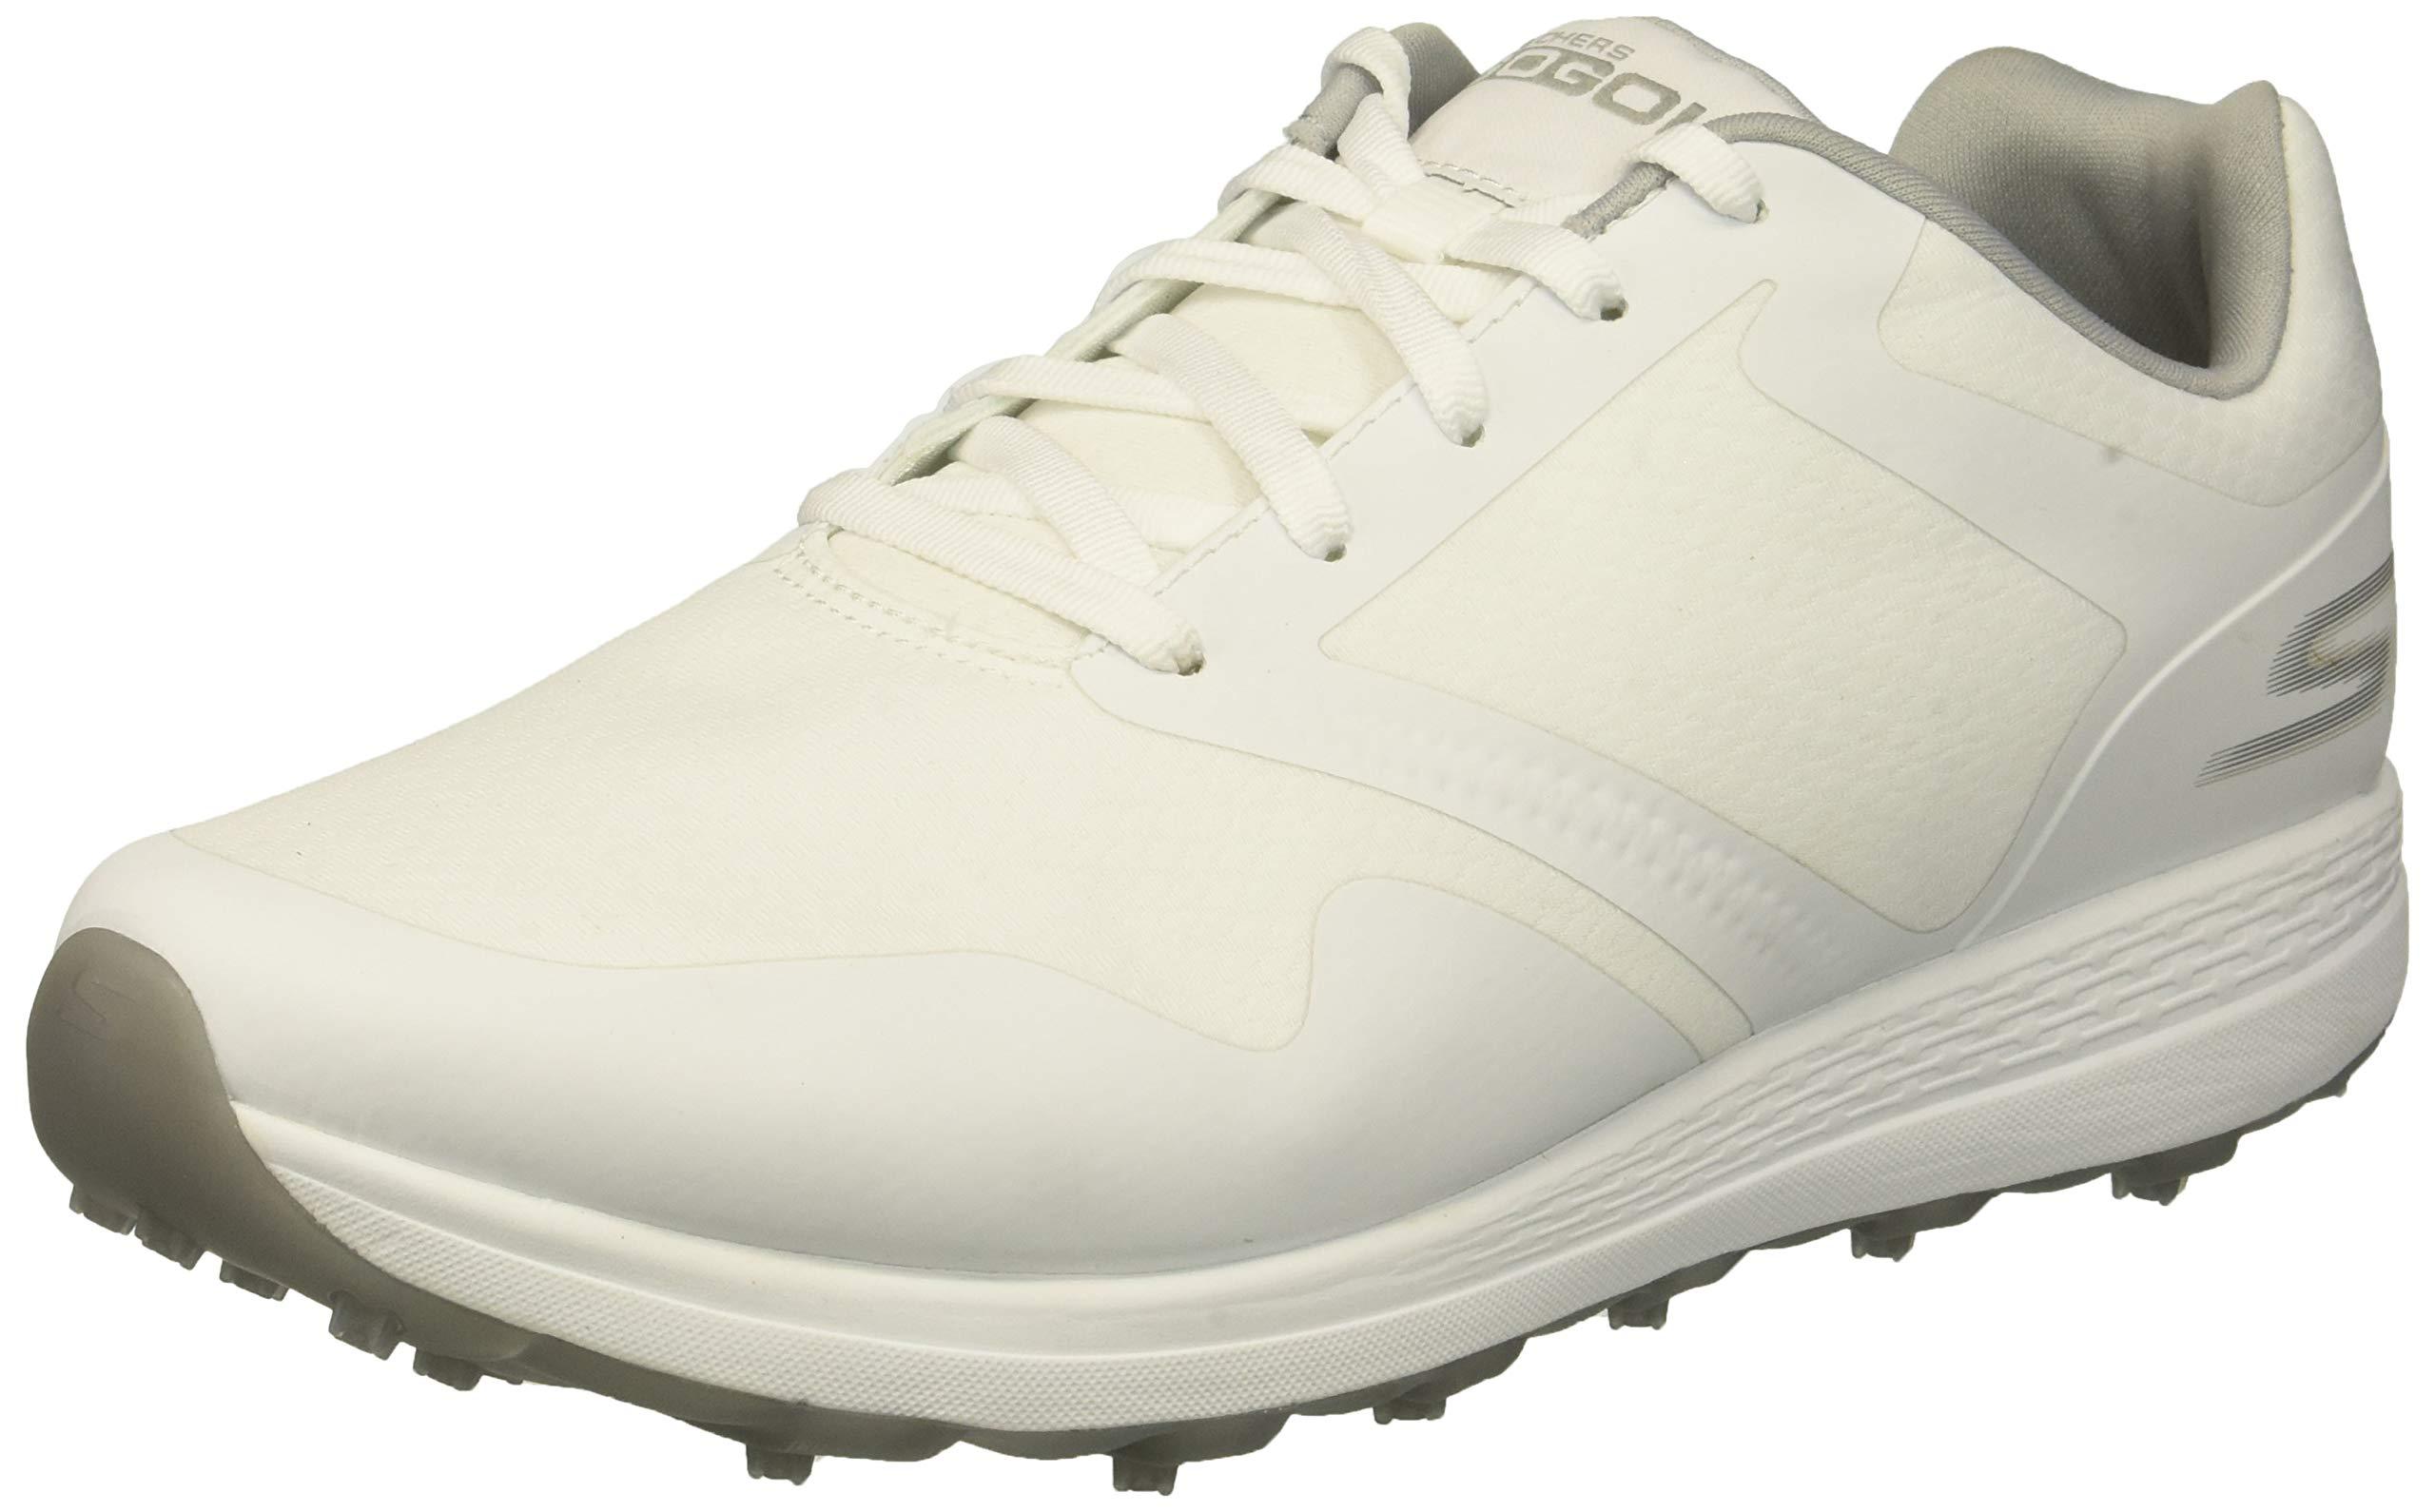 Skechers Women's Max Golf Shoe, White/Gray, 5.5 M US